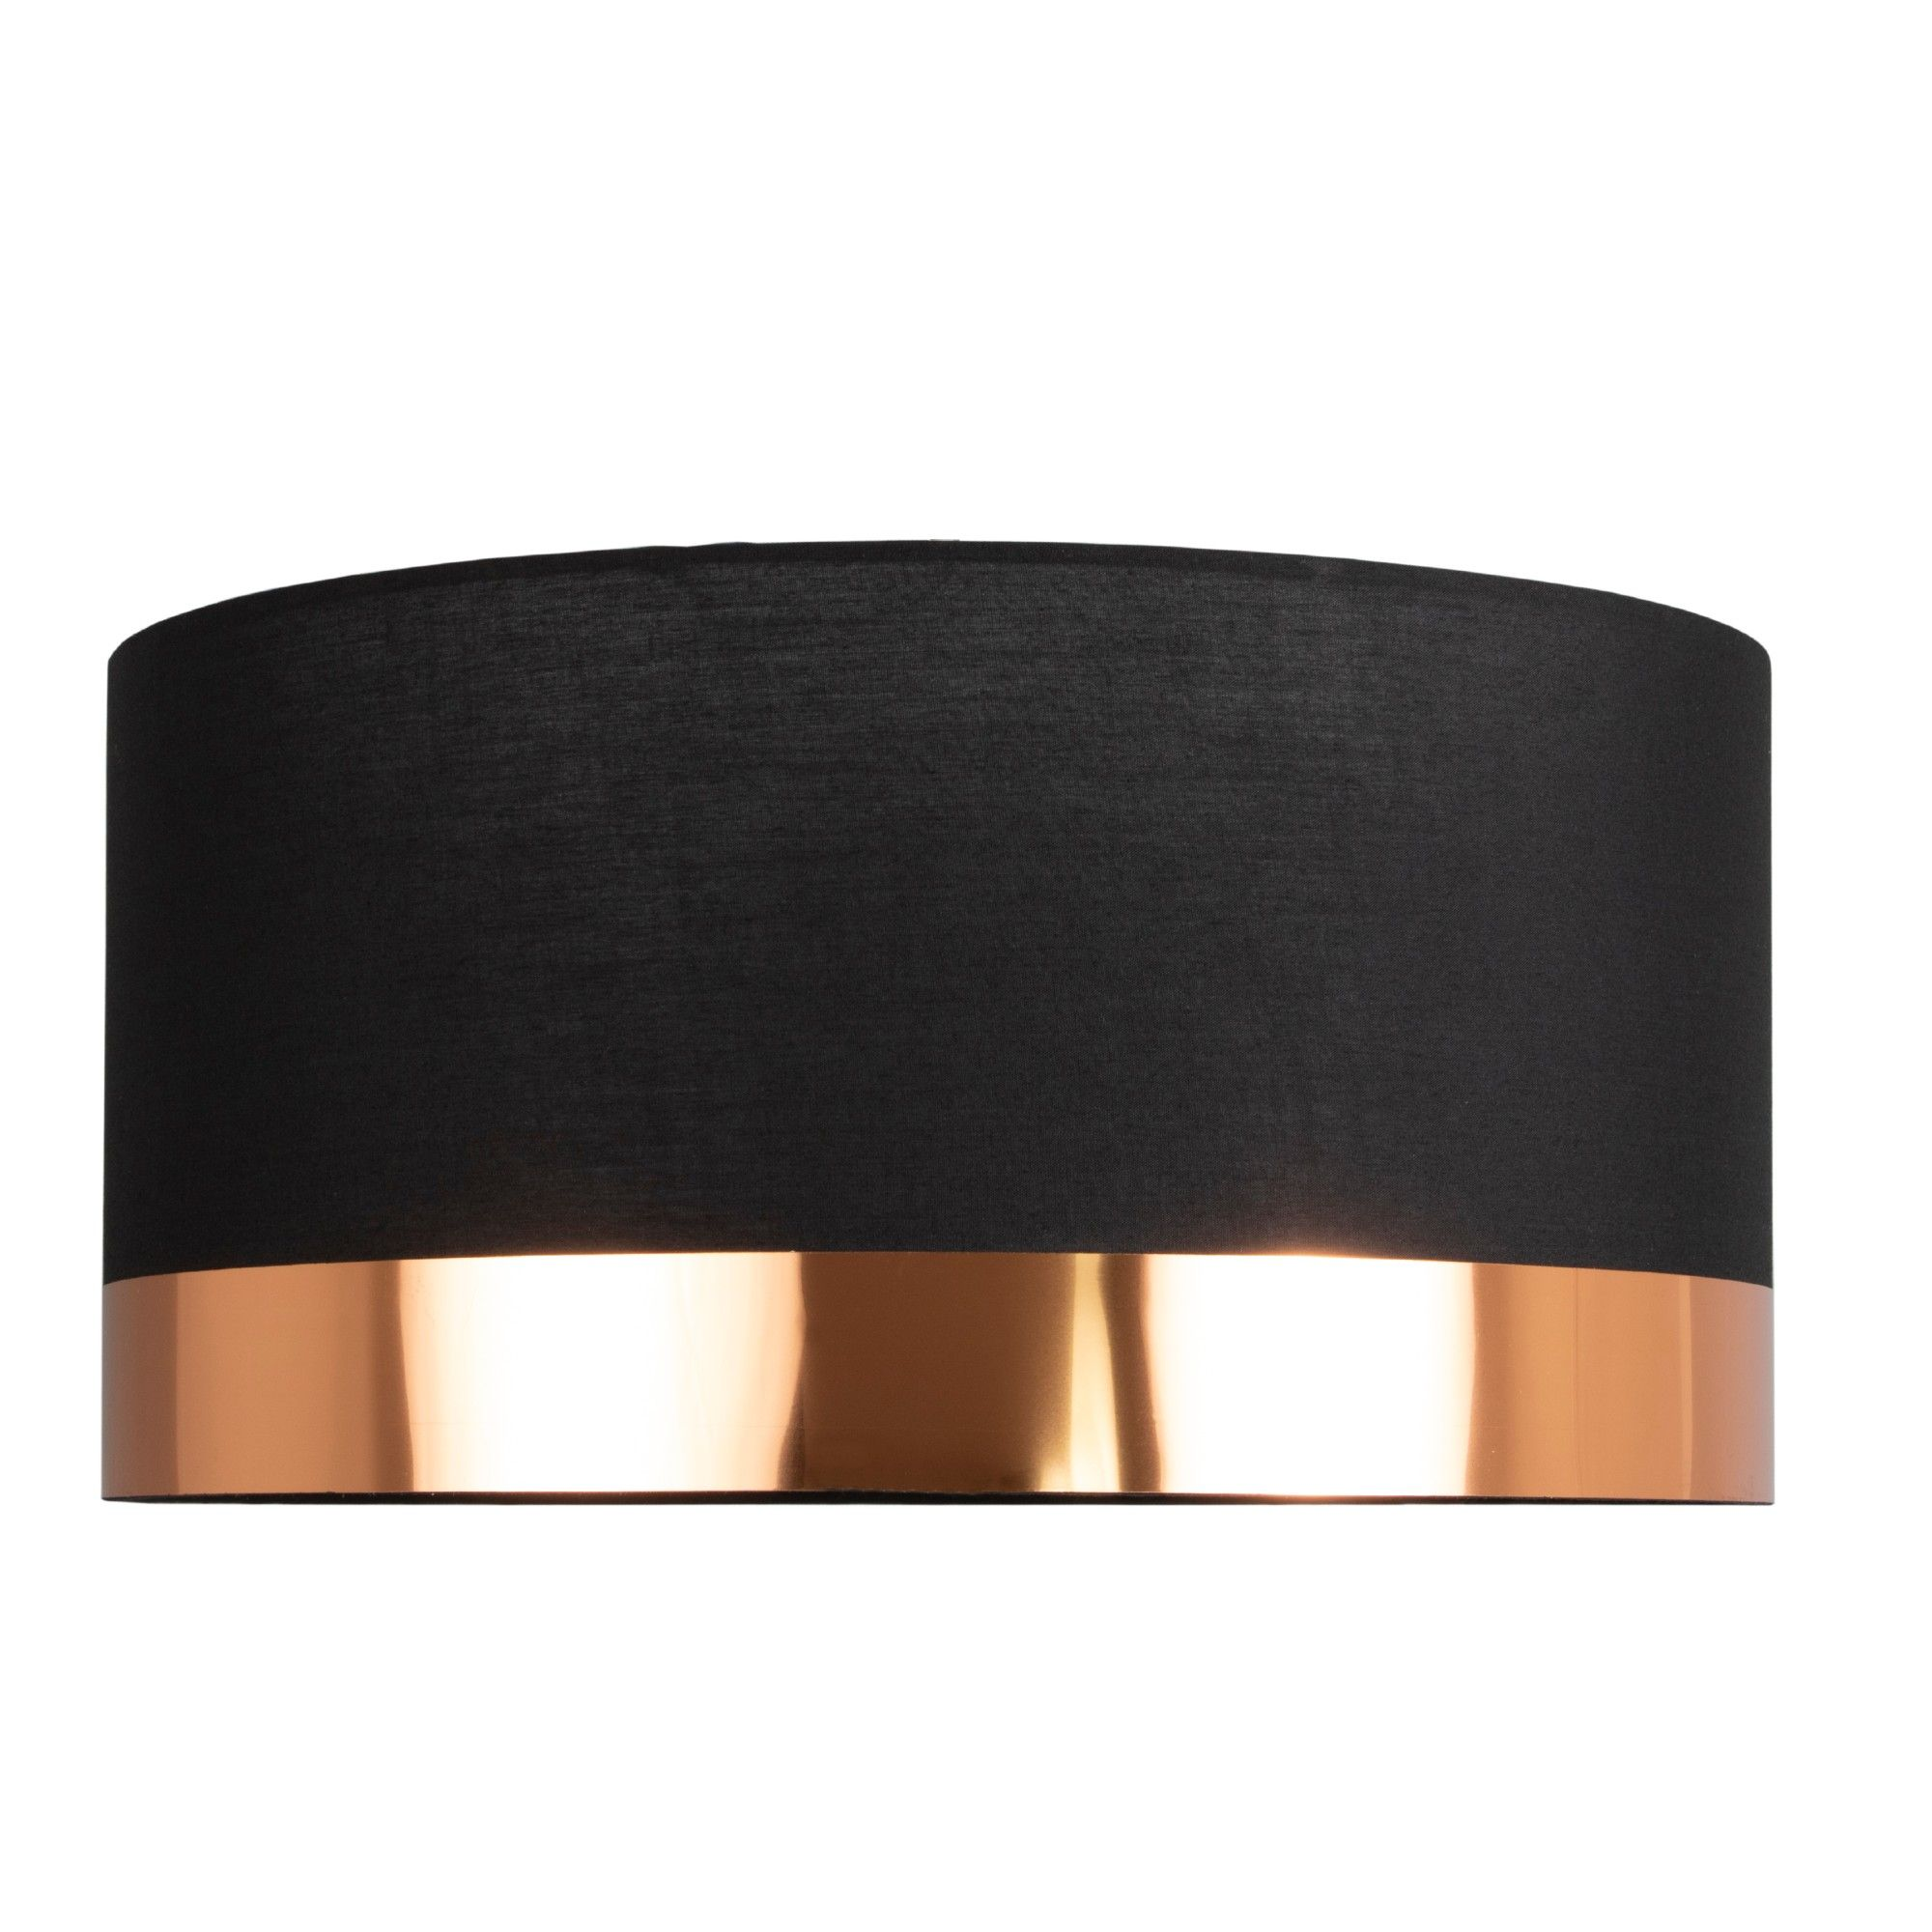 Nela Black and Copper 40cm Pendant Ceiling Light Shade